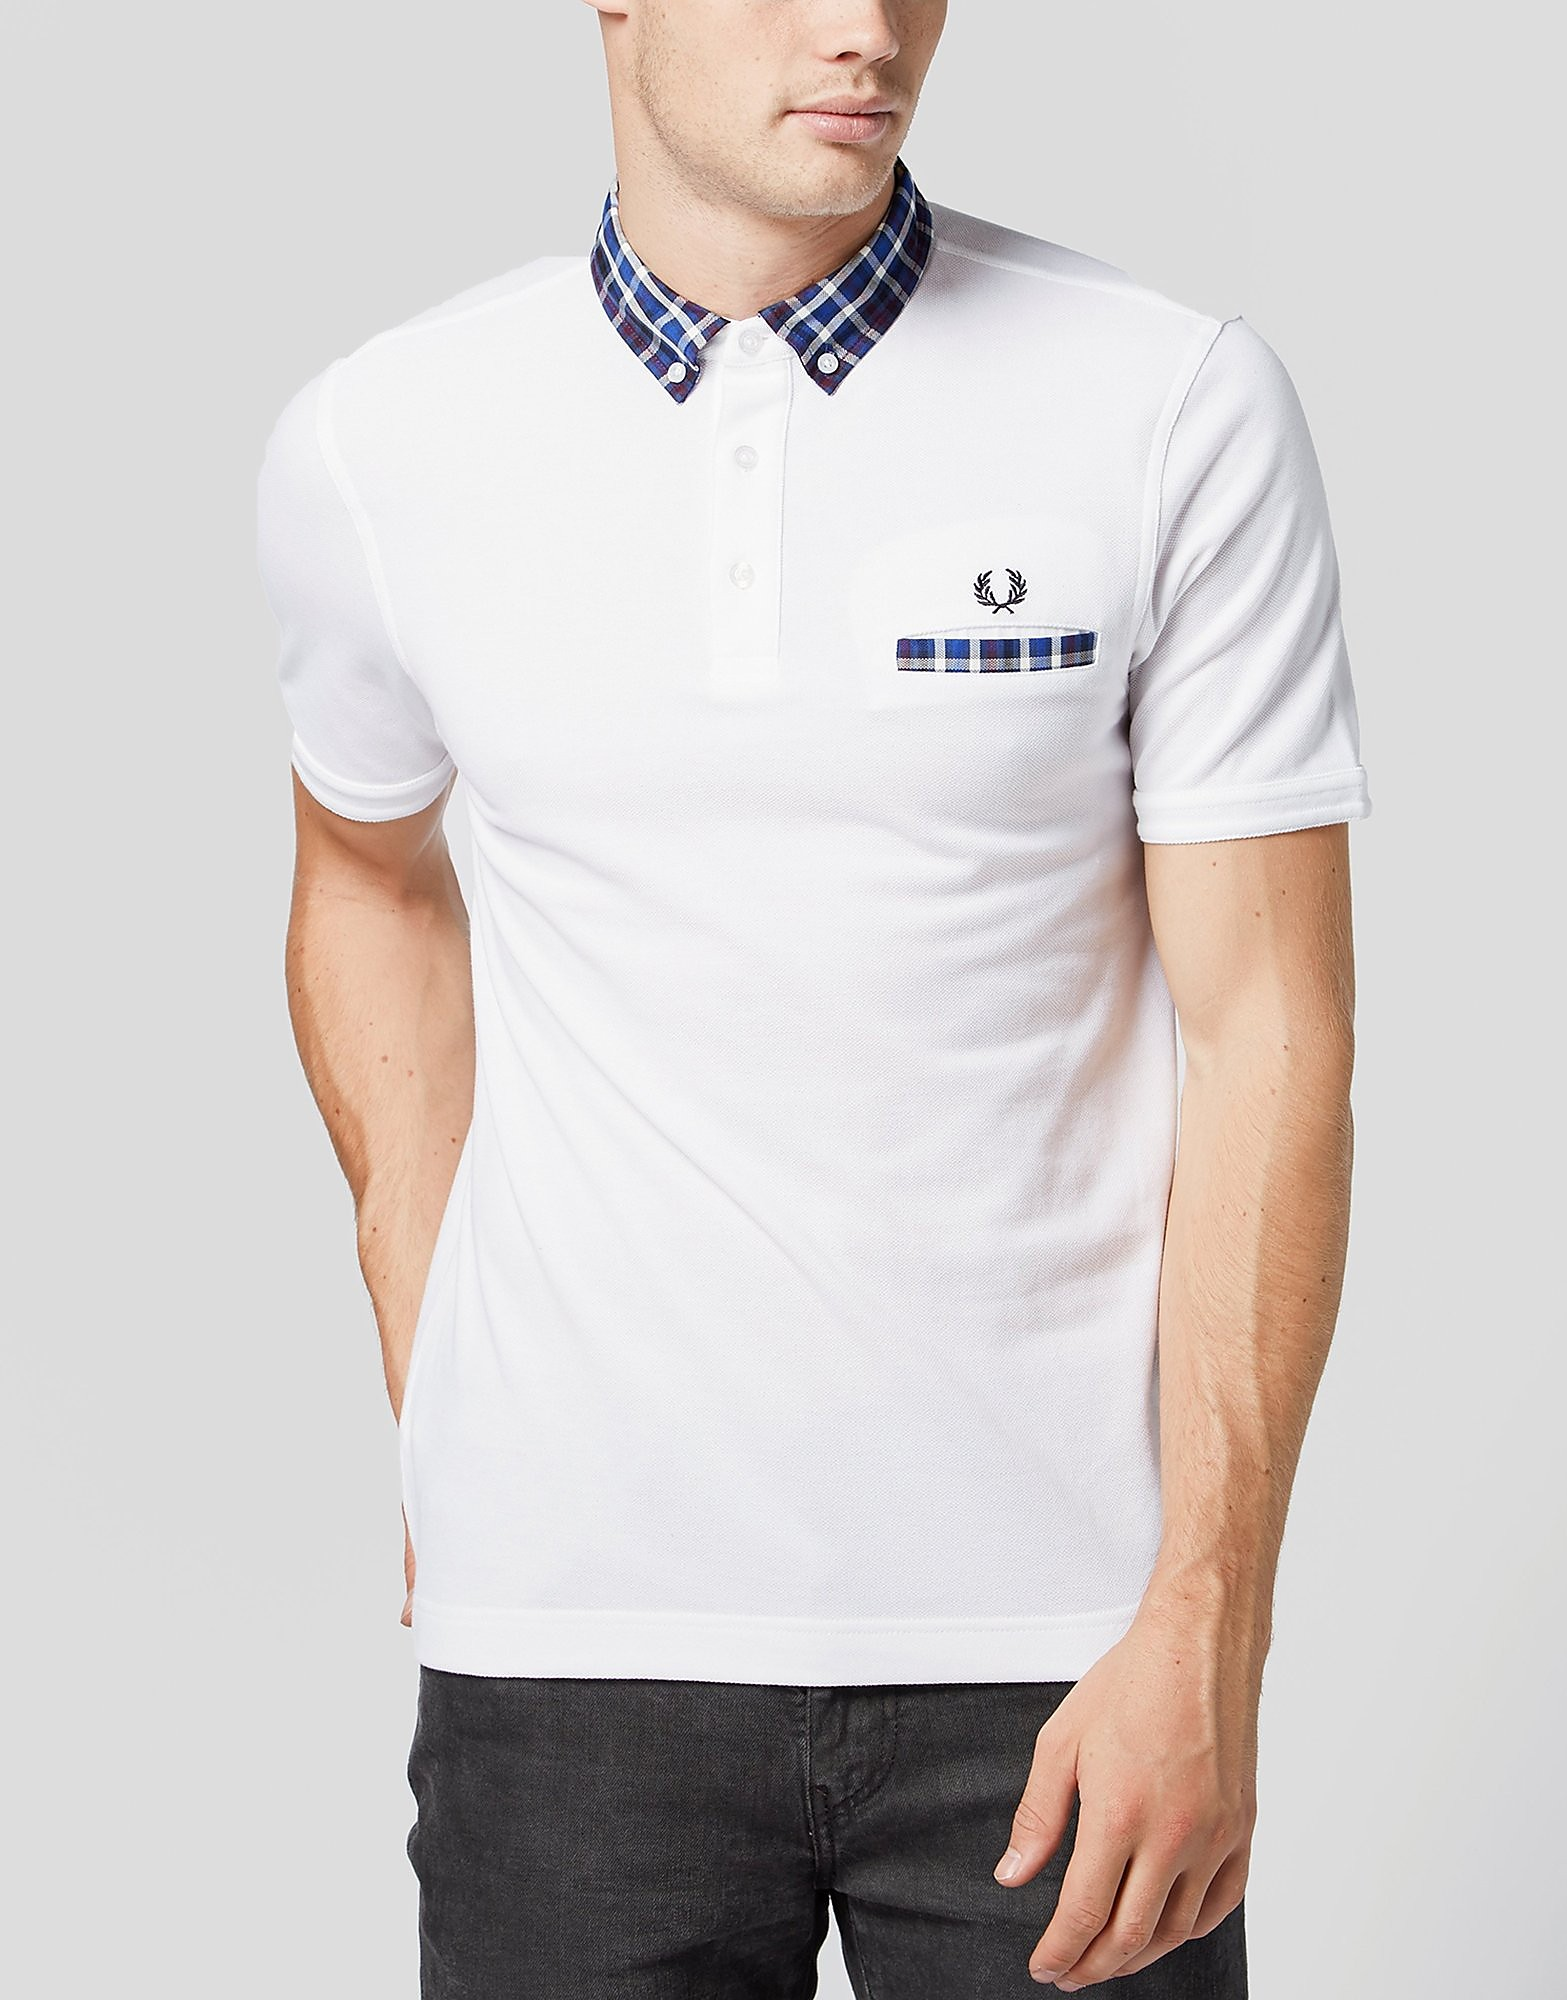 Fred Perry Herringbone Collar Polo Shirt  Exclusive  WhiteBlue WhiteBlue